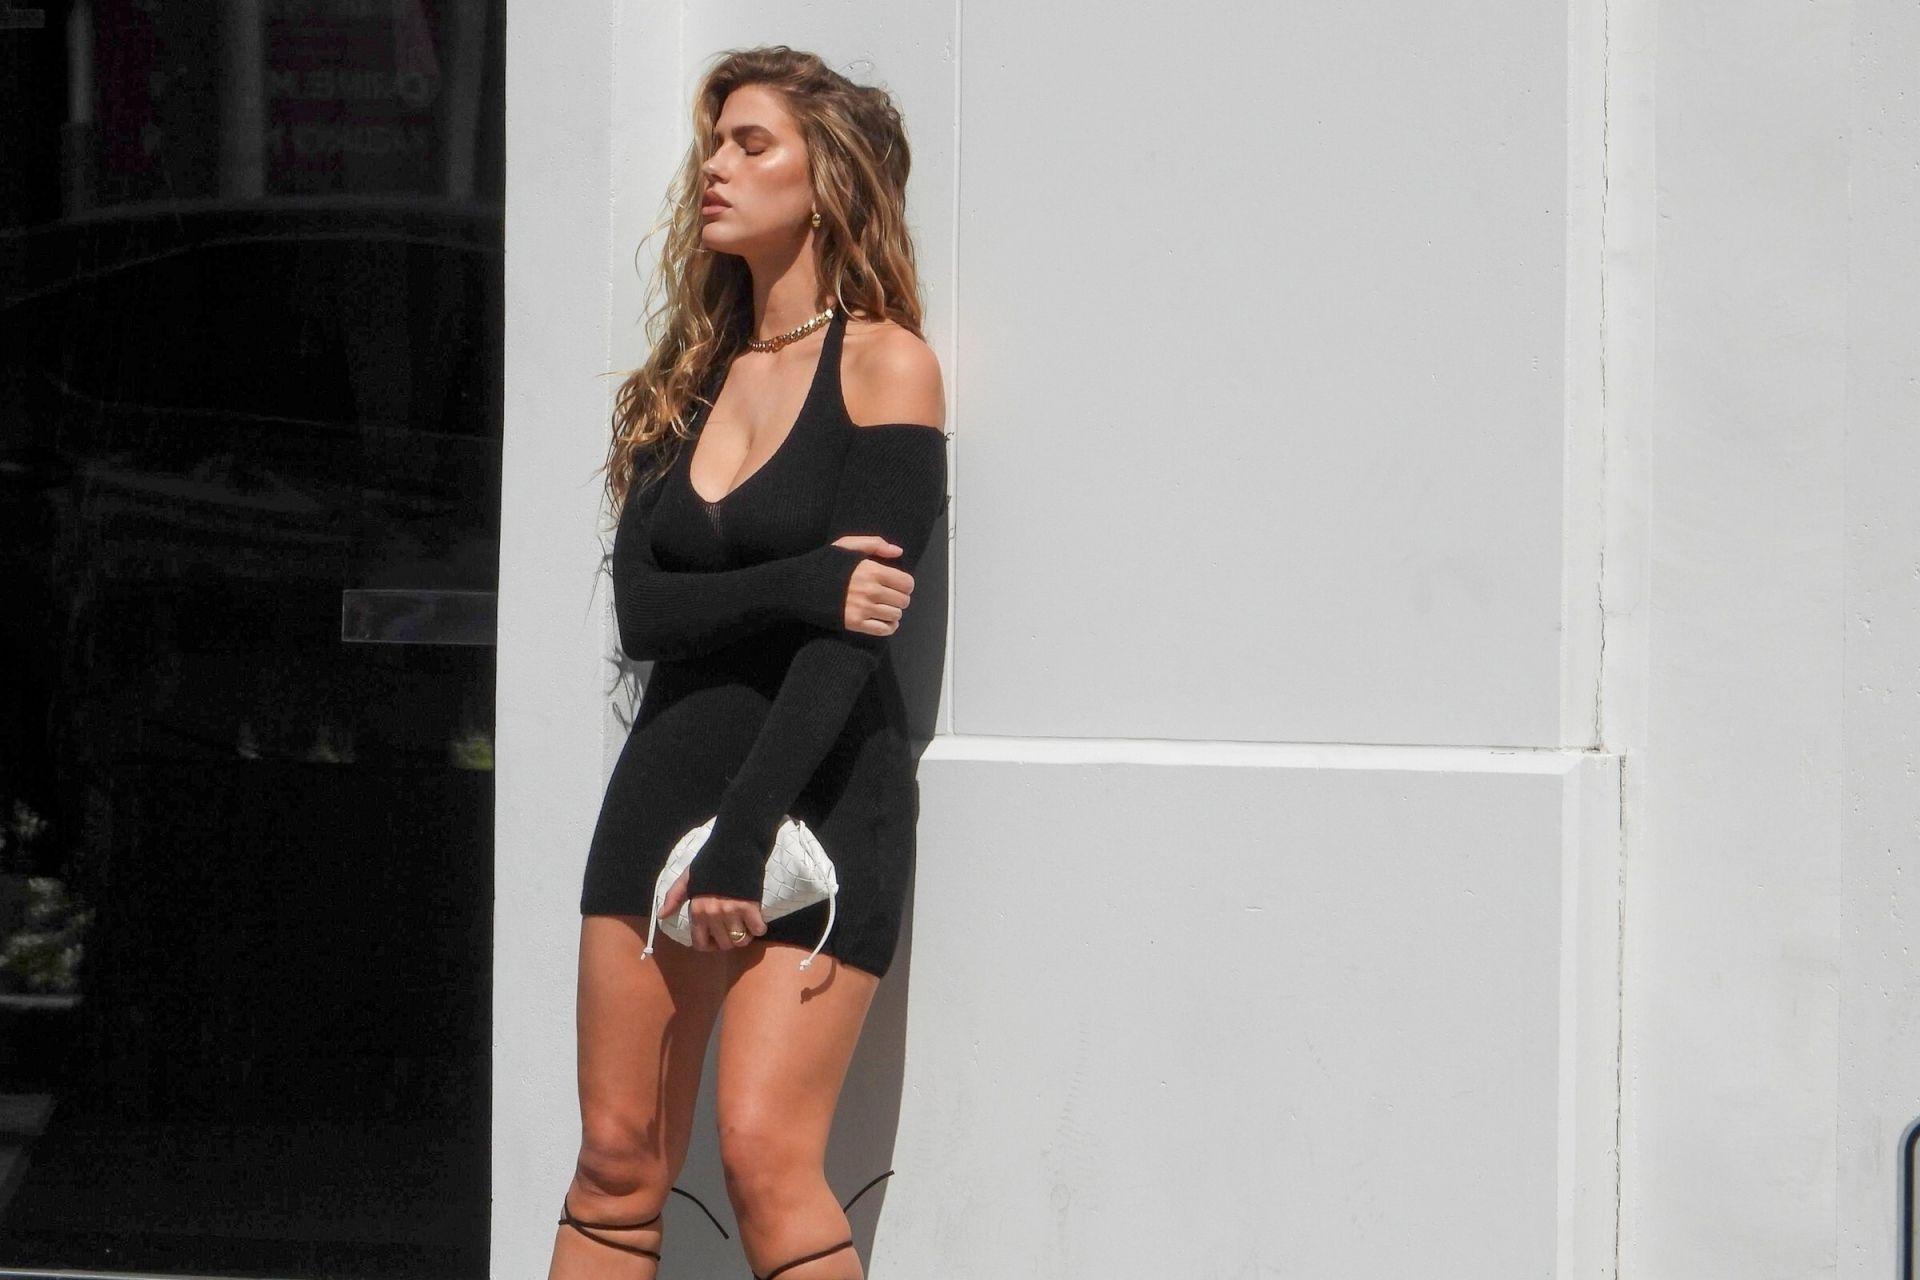 Kara Del Toro Sexy Short Dress